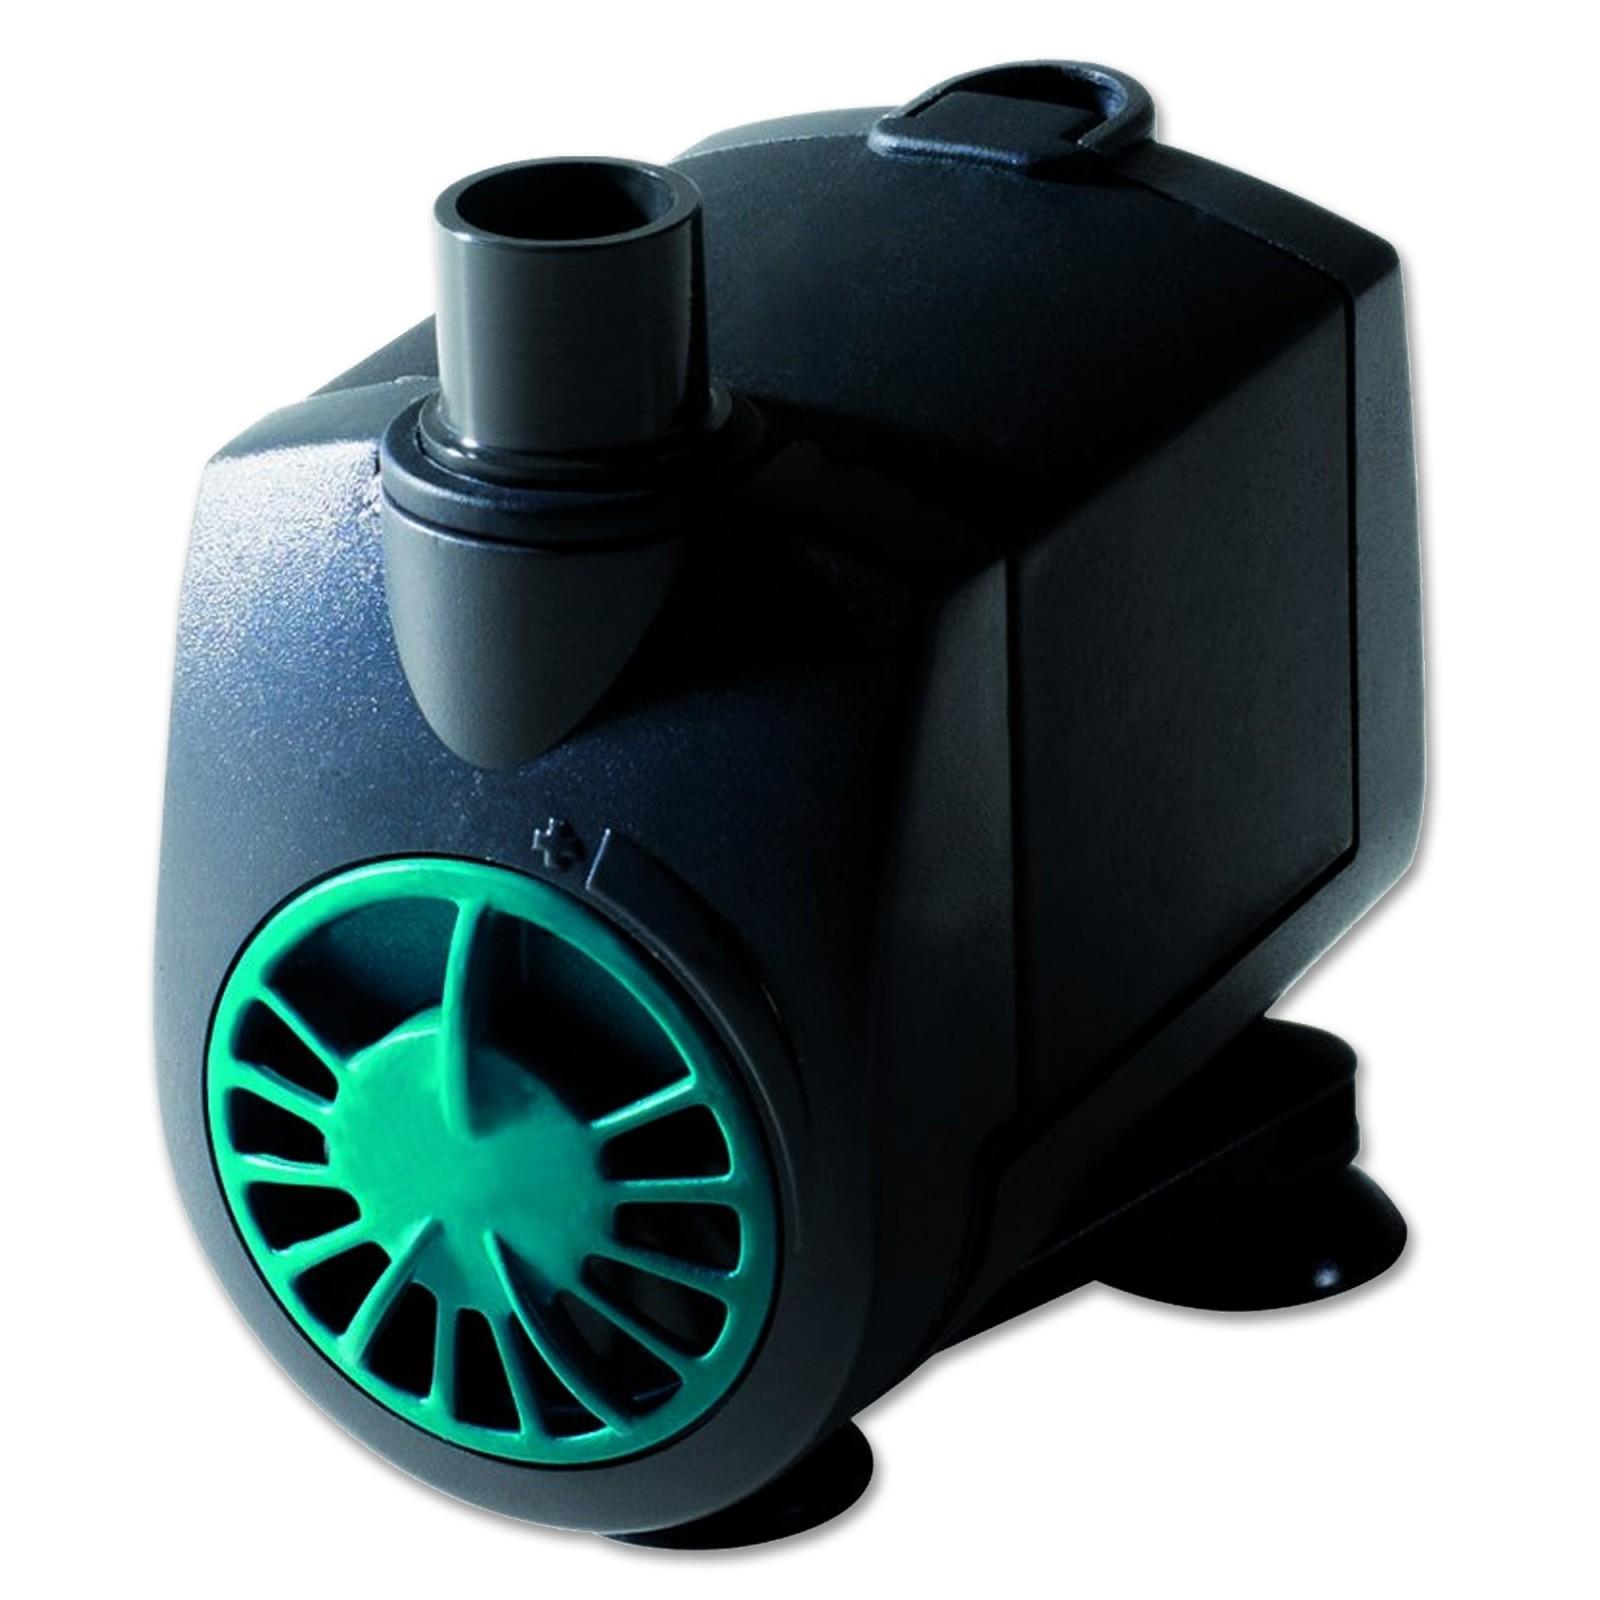 Newa jet nj 600 pompa per acquari regolabile 200 600 lt for Pompa sifone per acquari